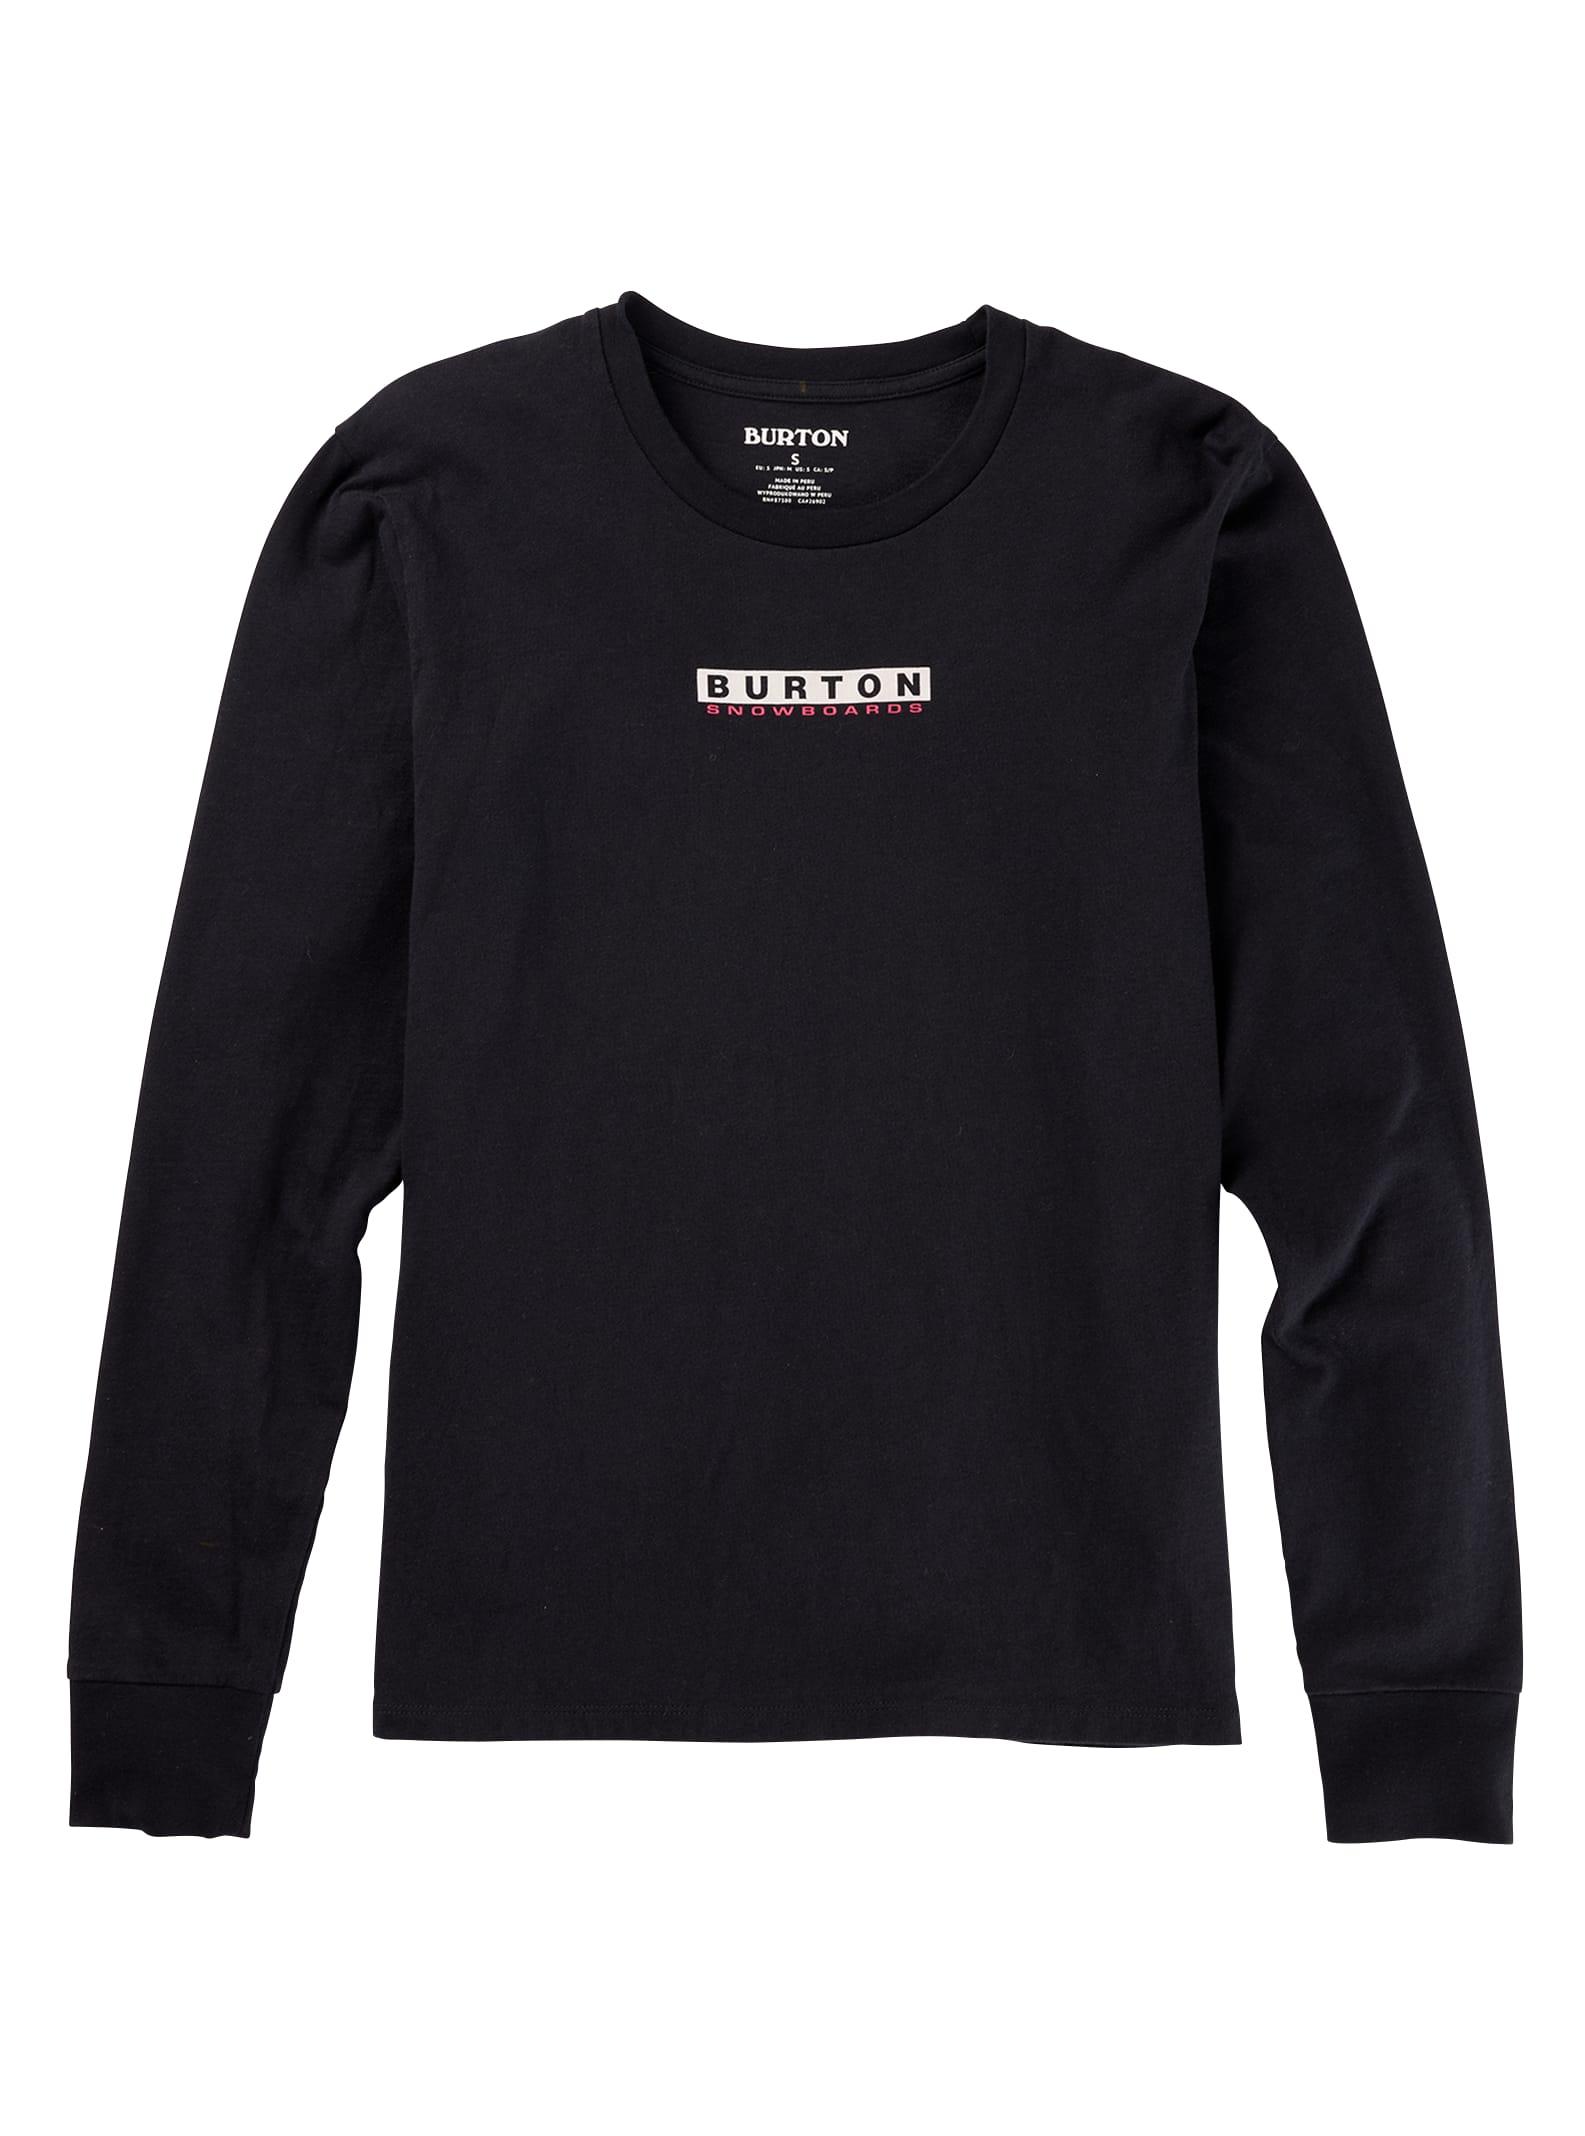 Burton Type långärmad t-shirt för damer, M